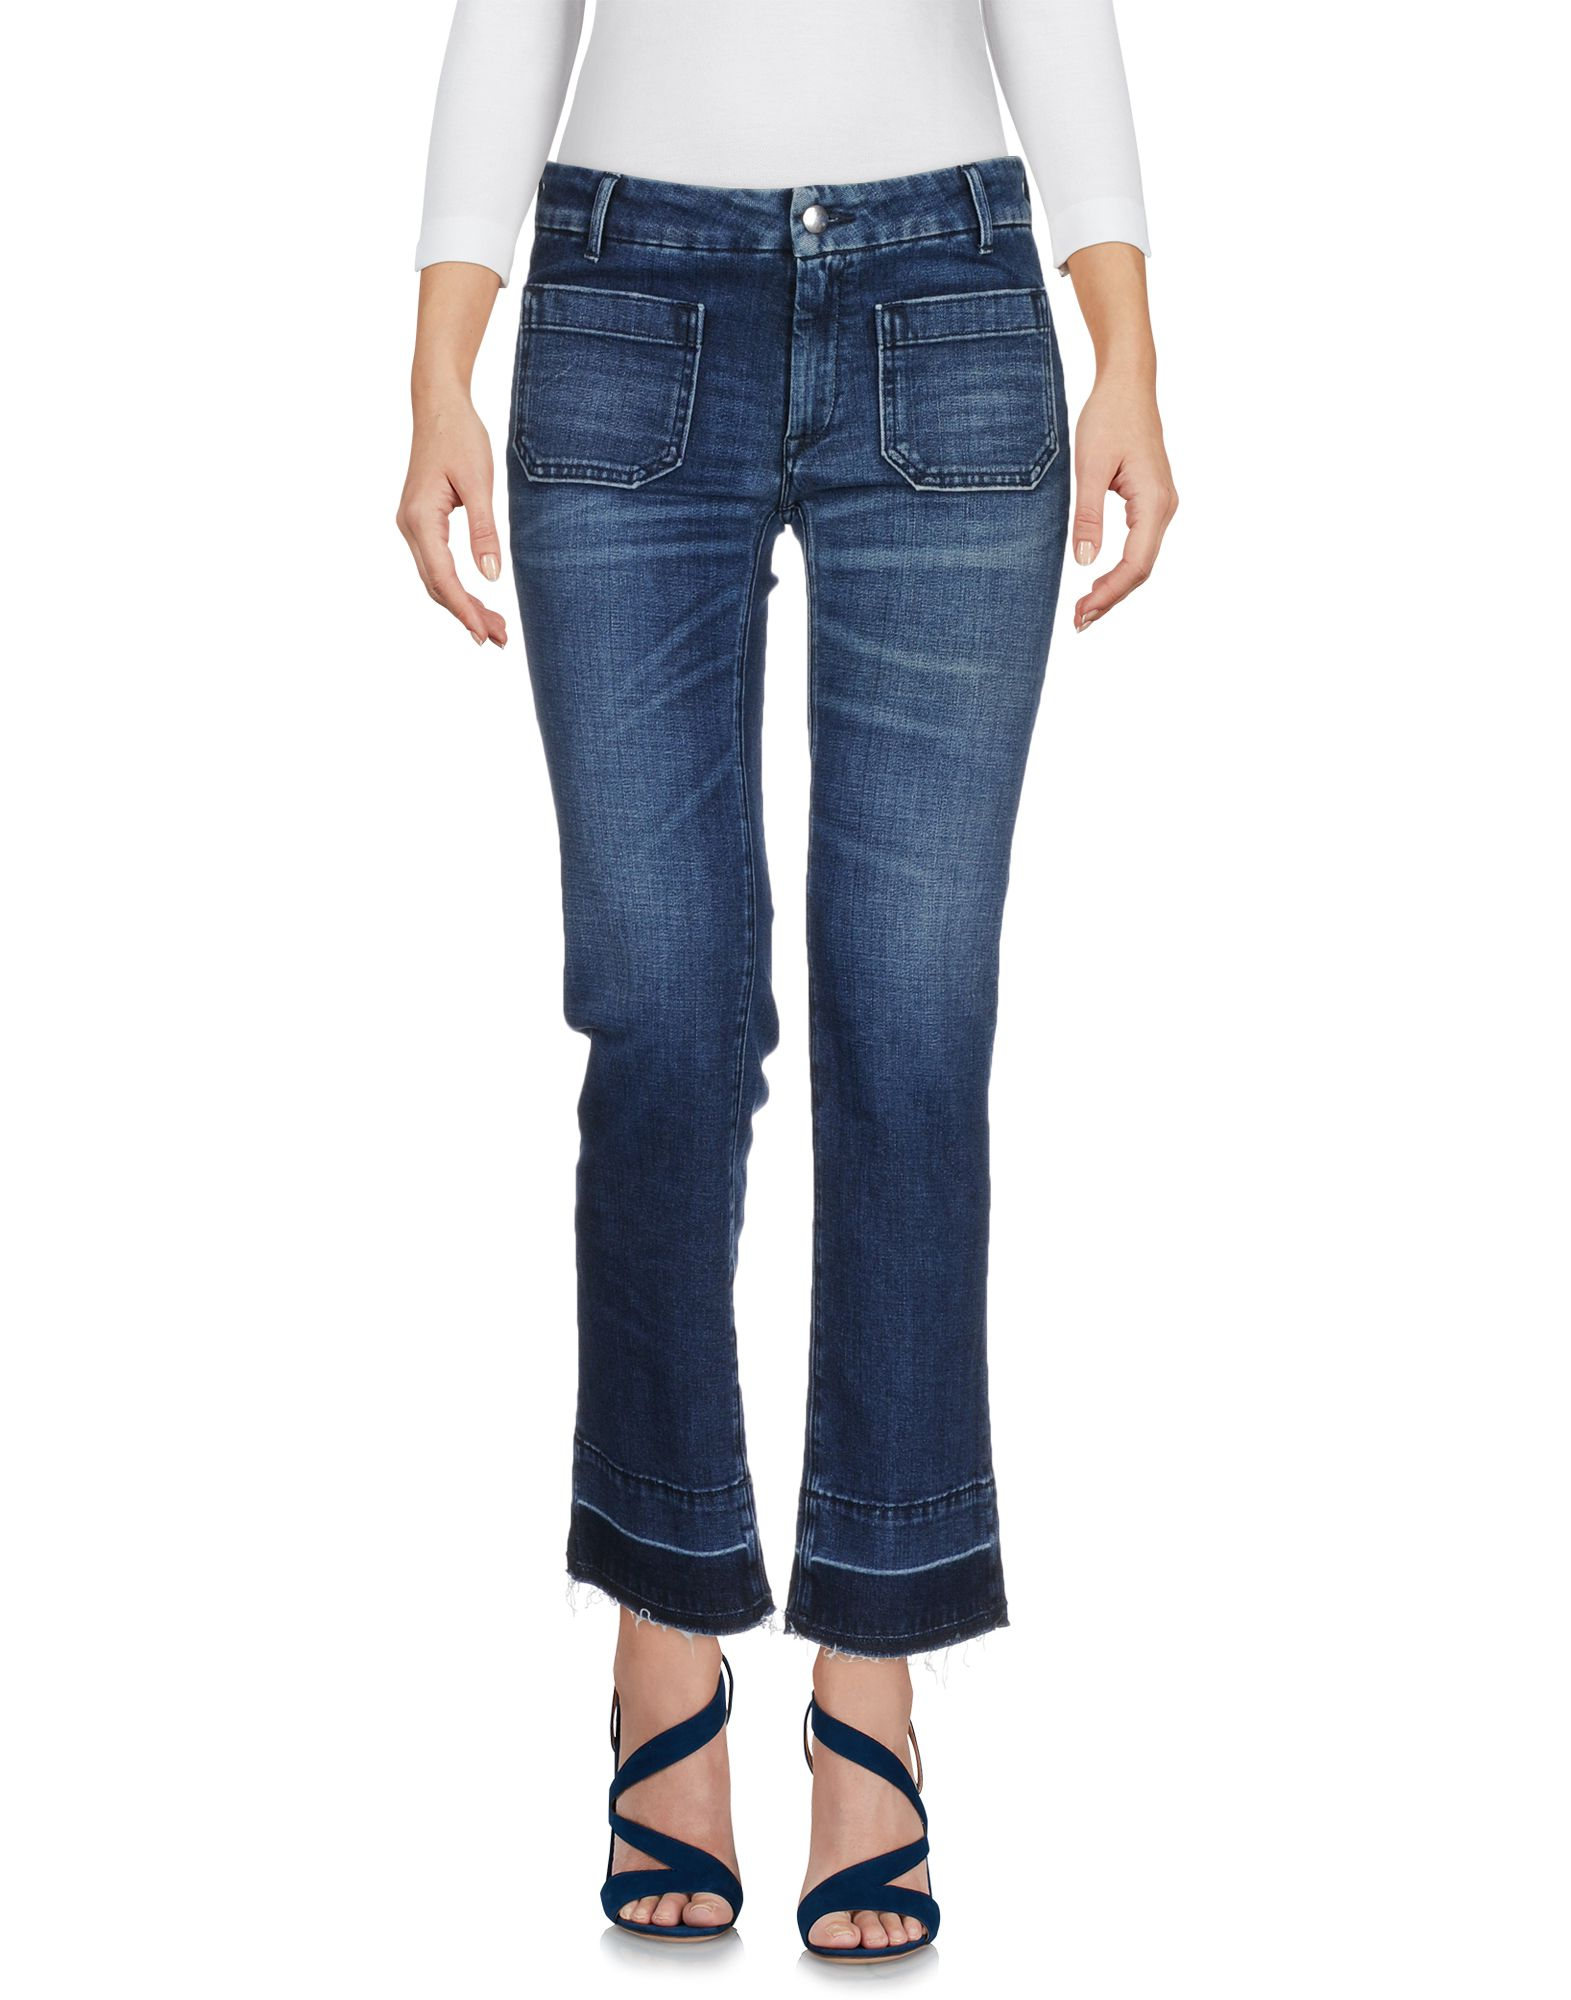 Pantaloni Jeans The Seafarer Donna - Acquista online su CmGa6A